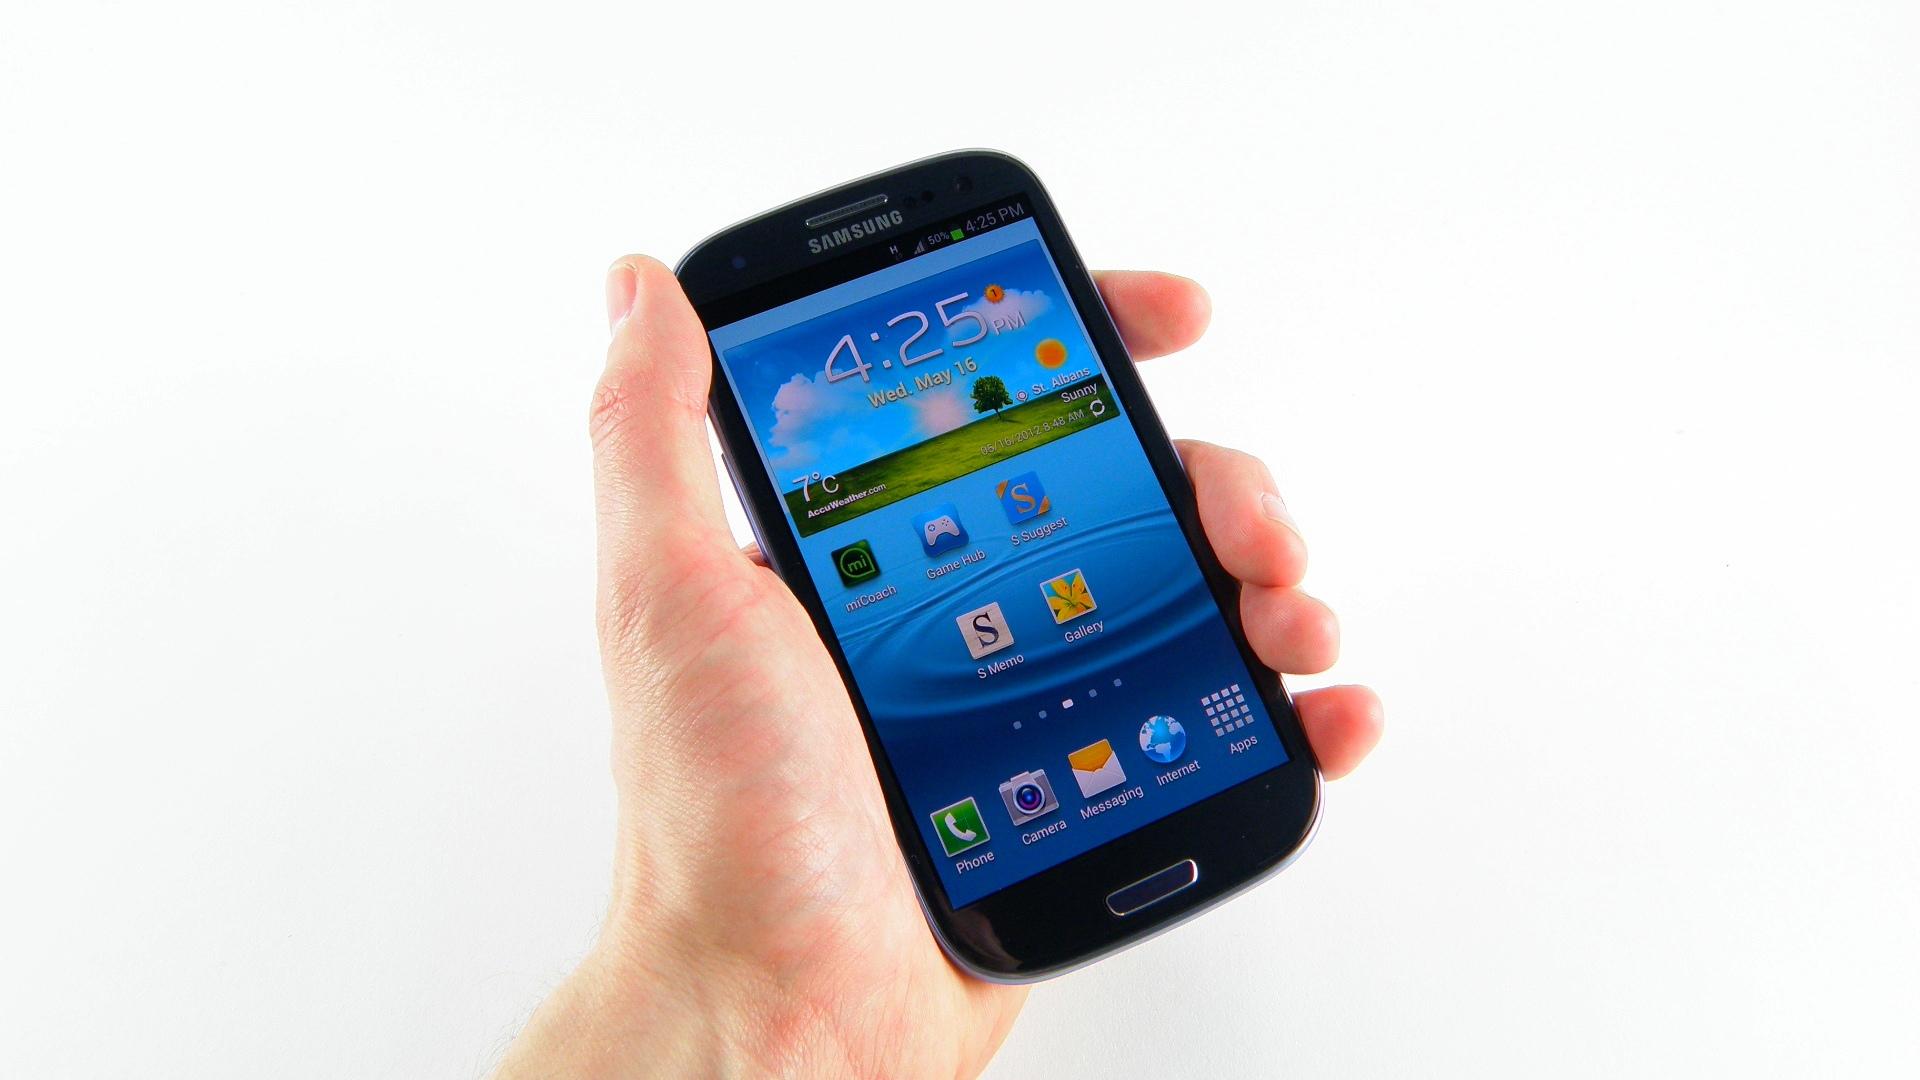 Samsung galaxy s4 mini on a white background wallpapers and images samsung galaxy s4 mini on a white background voltagebd Gallery